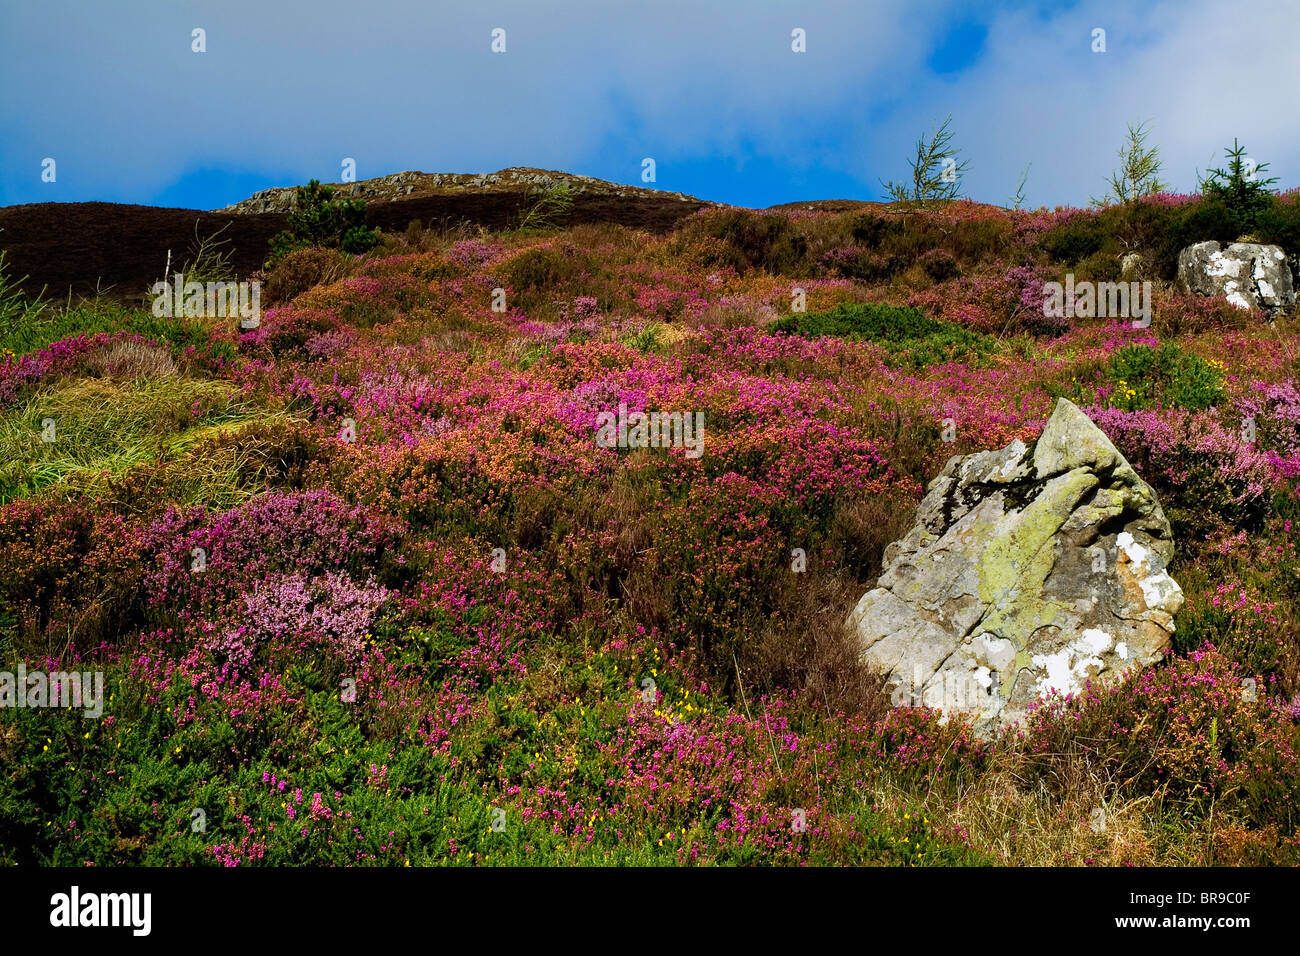 Slieve Gullion, Co. Armagh, Ireland Stock Photo